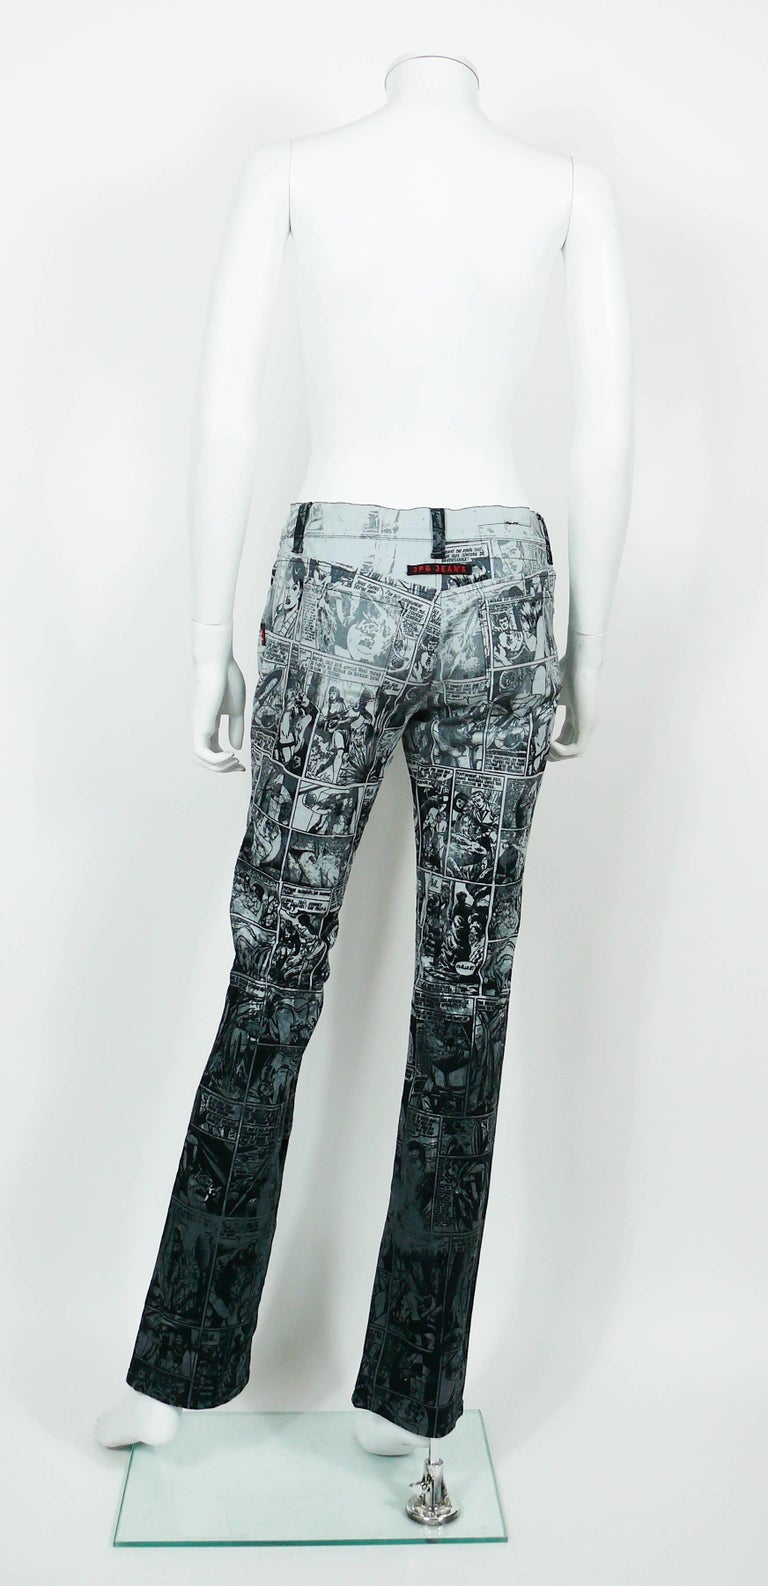 Jean Paul Gaultier Comic Cartoon Print Pants Trousers  For Sale 3